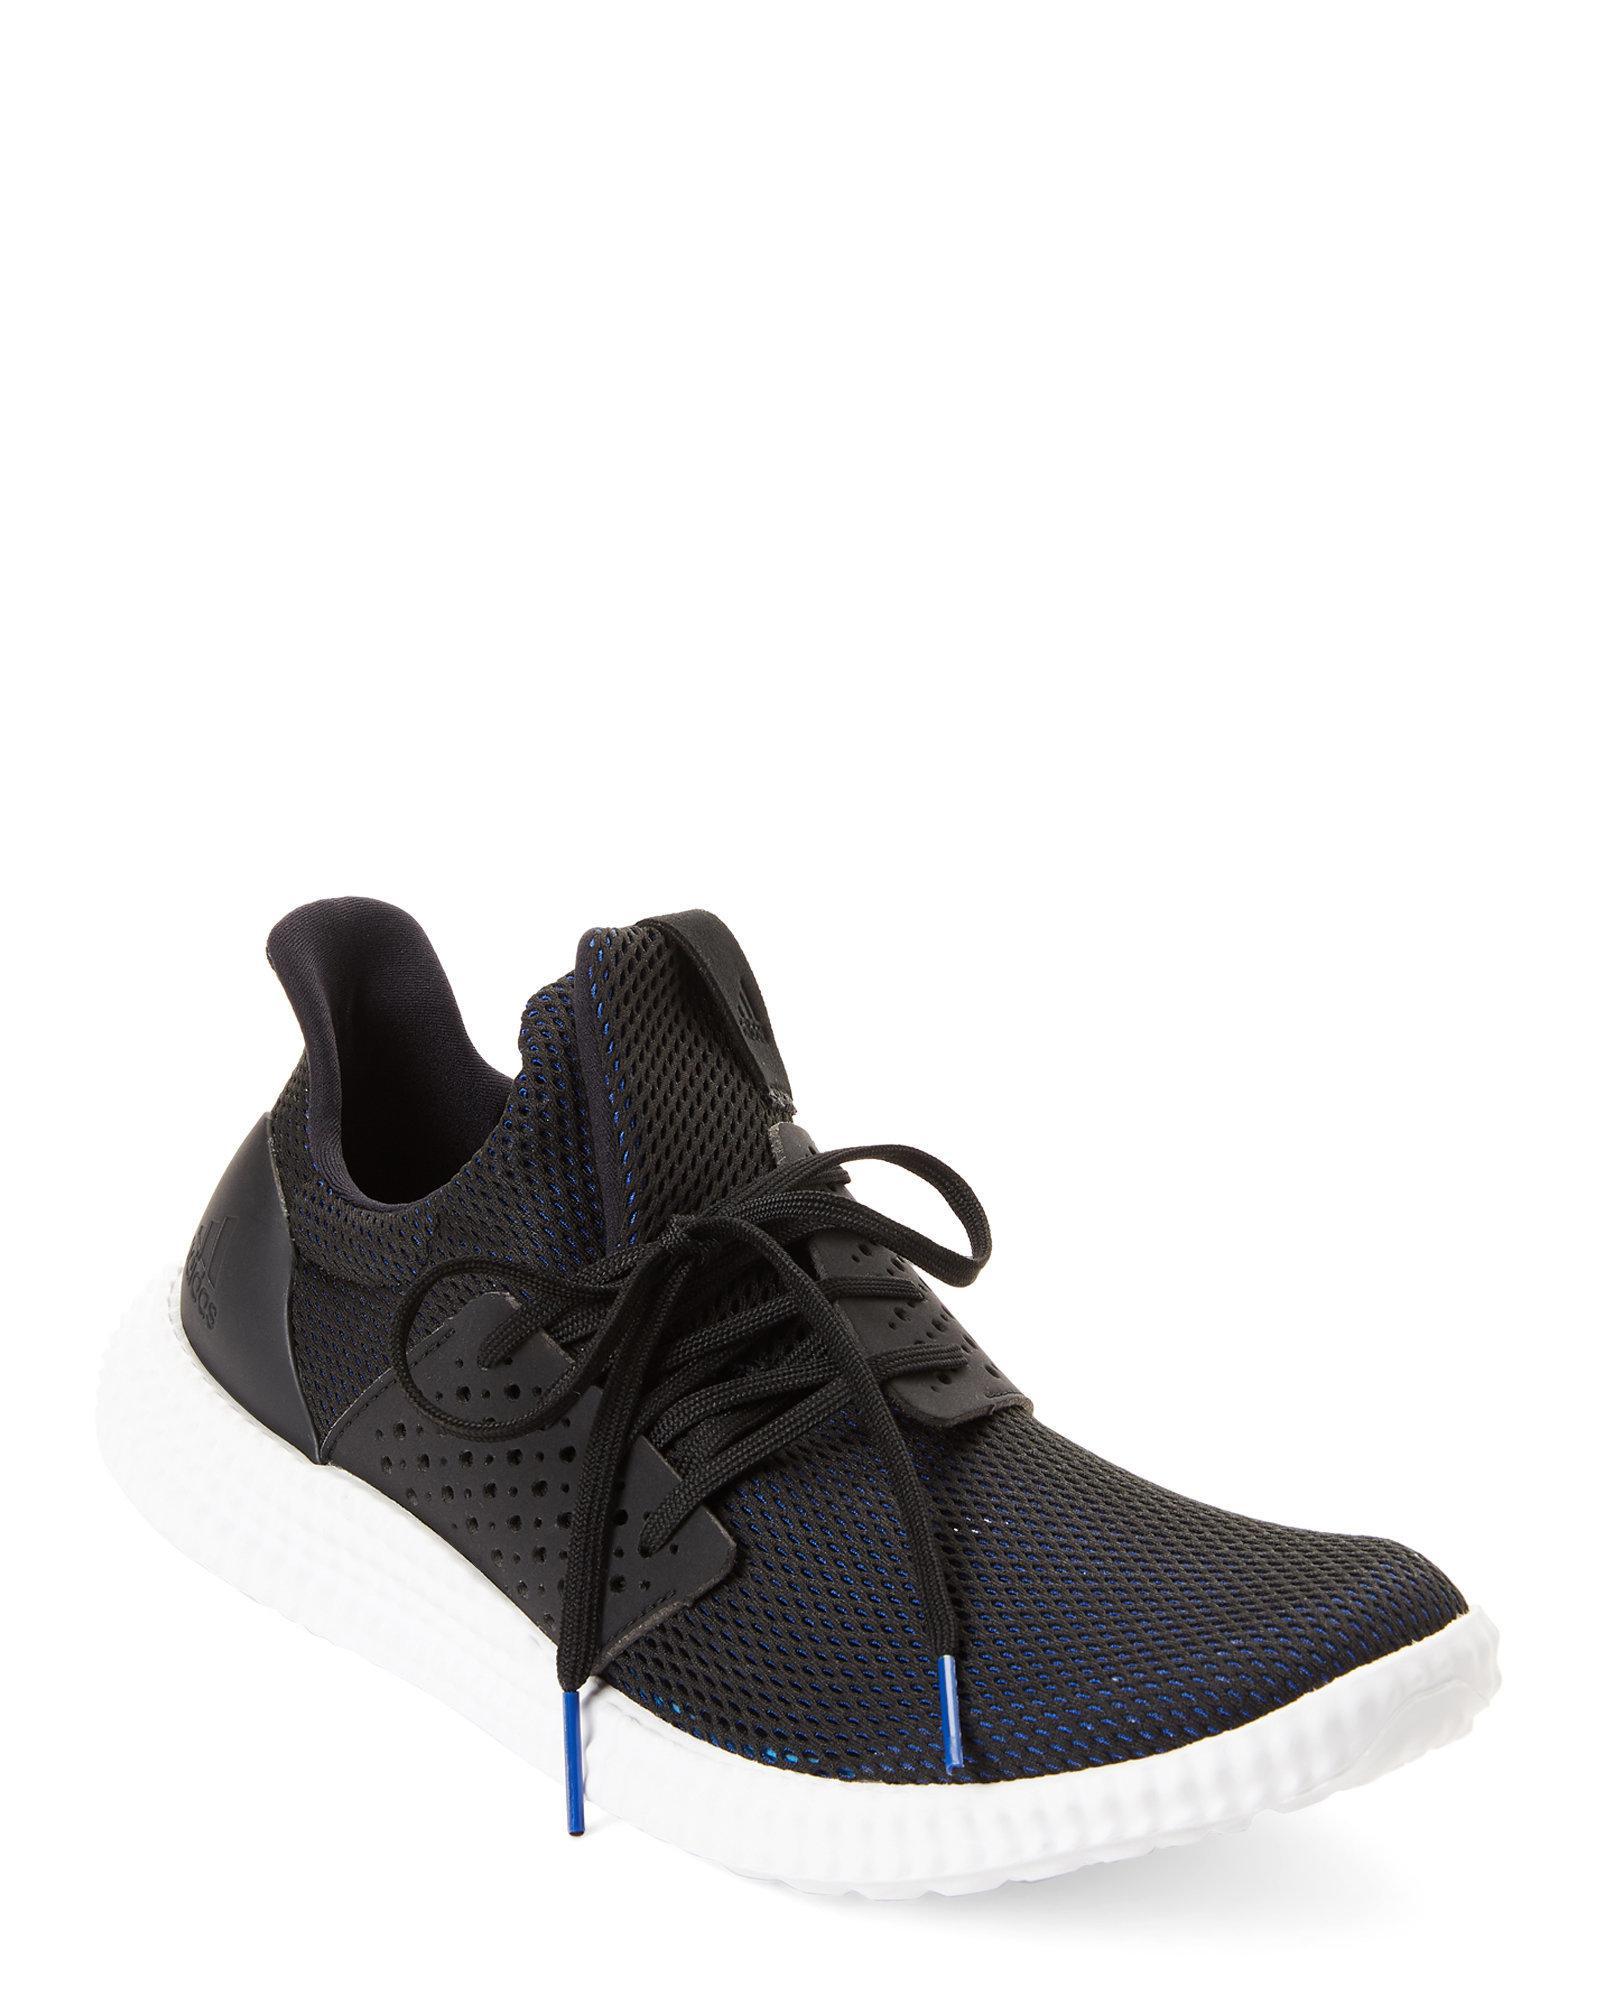 new products d3401 ad191 adidas-Black-Black-Athletics-247-Training-Sneakers.jpeg